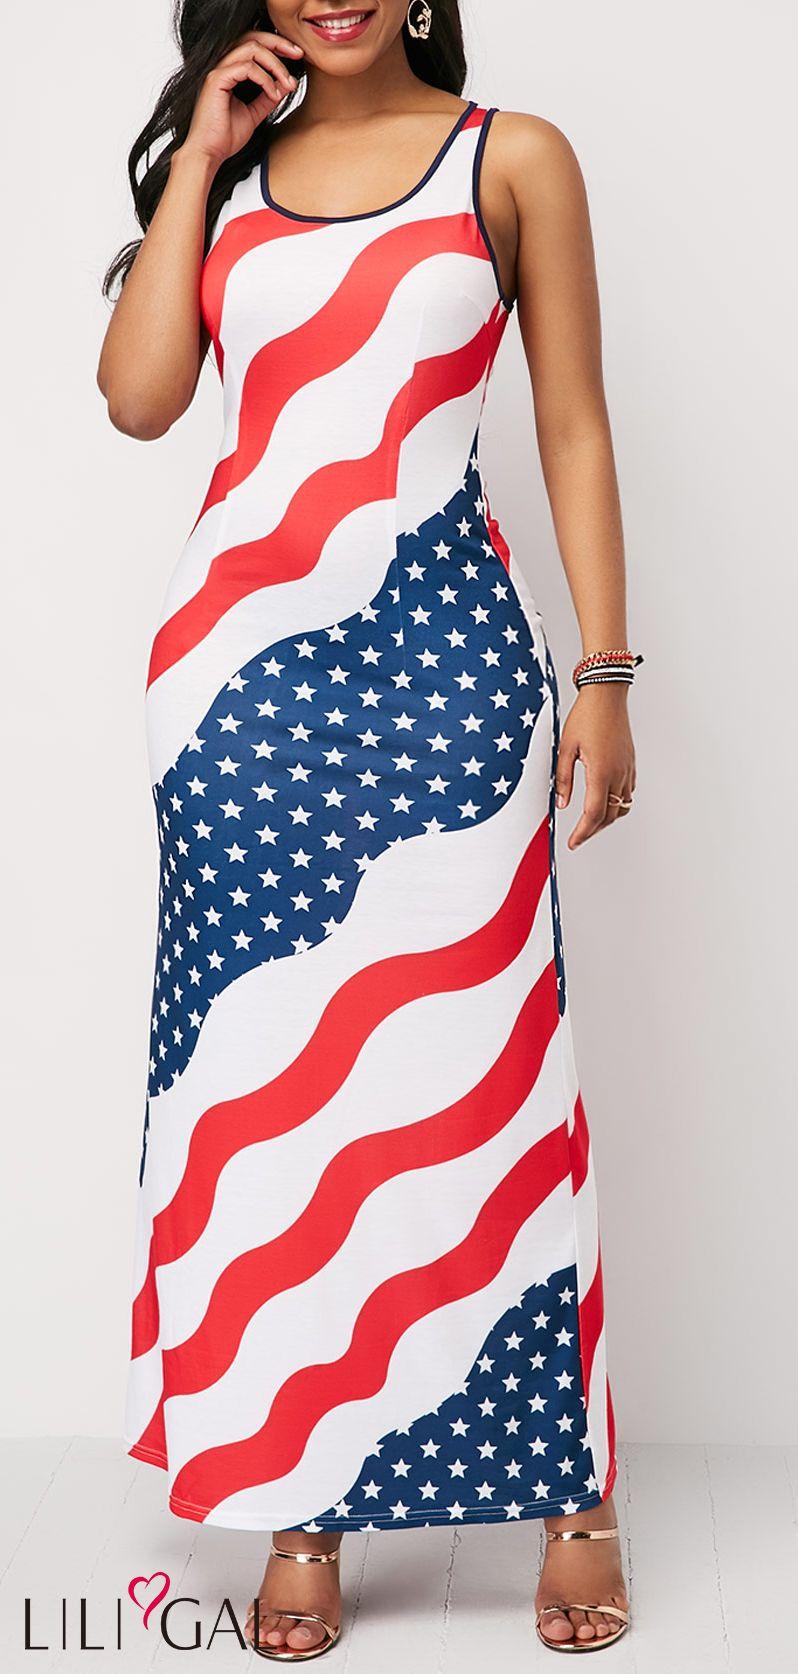 31873d0da9a Star Print Round Neck Sleeveless Maxi Dress  liligal  4thofjuly   fourthofjuly  patriotic